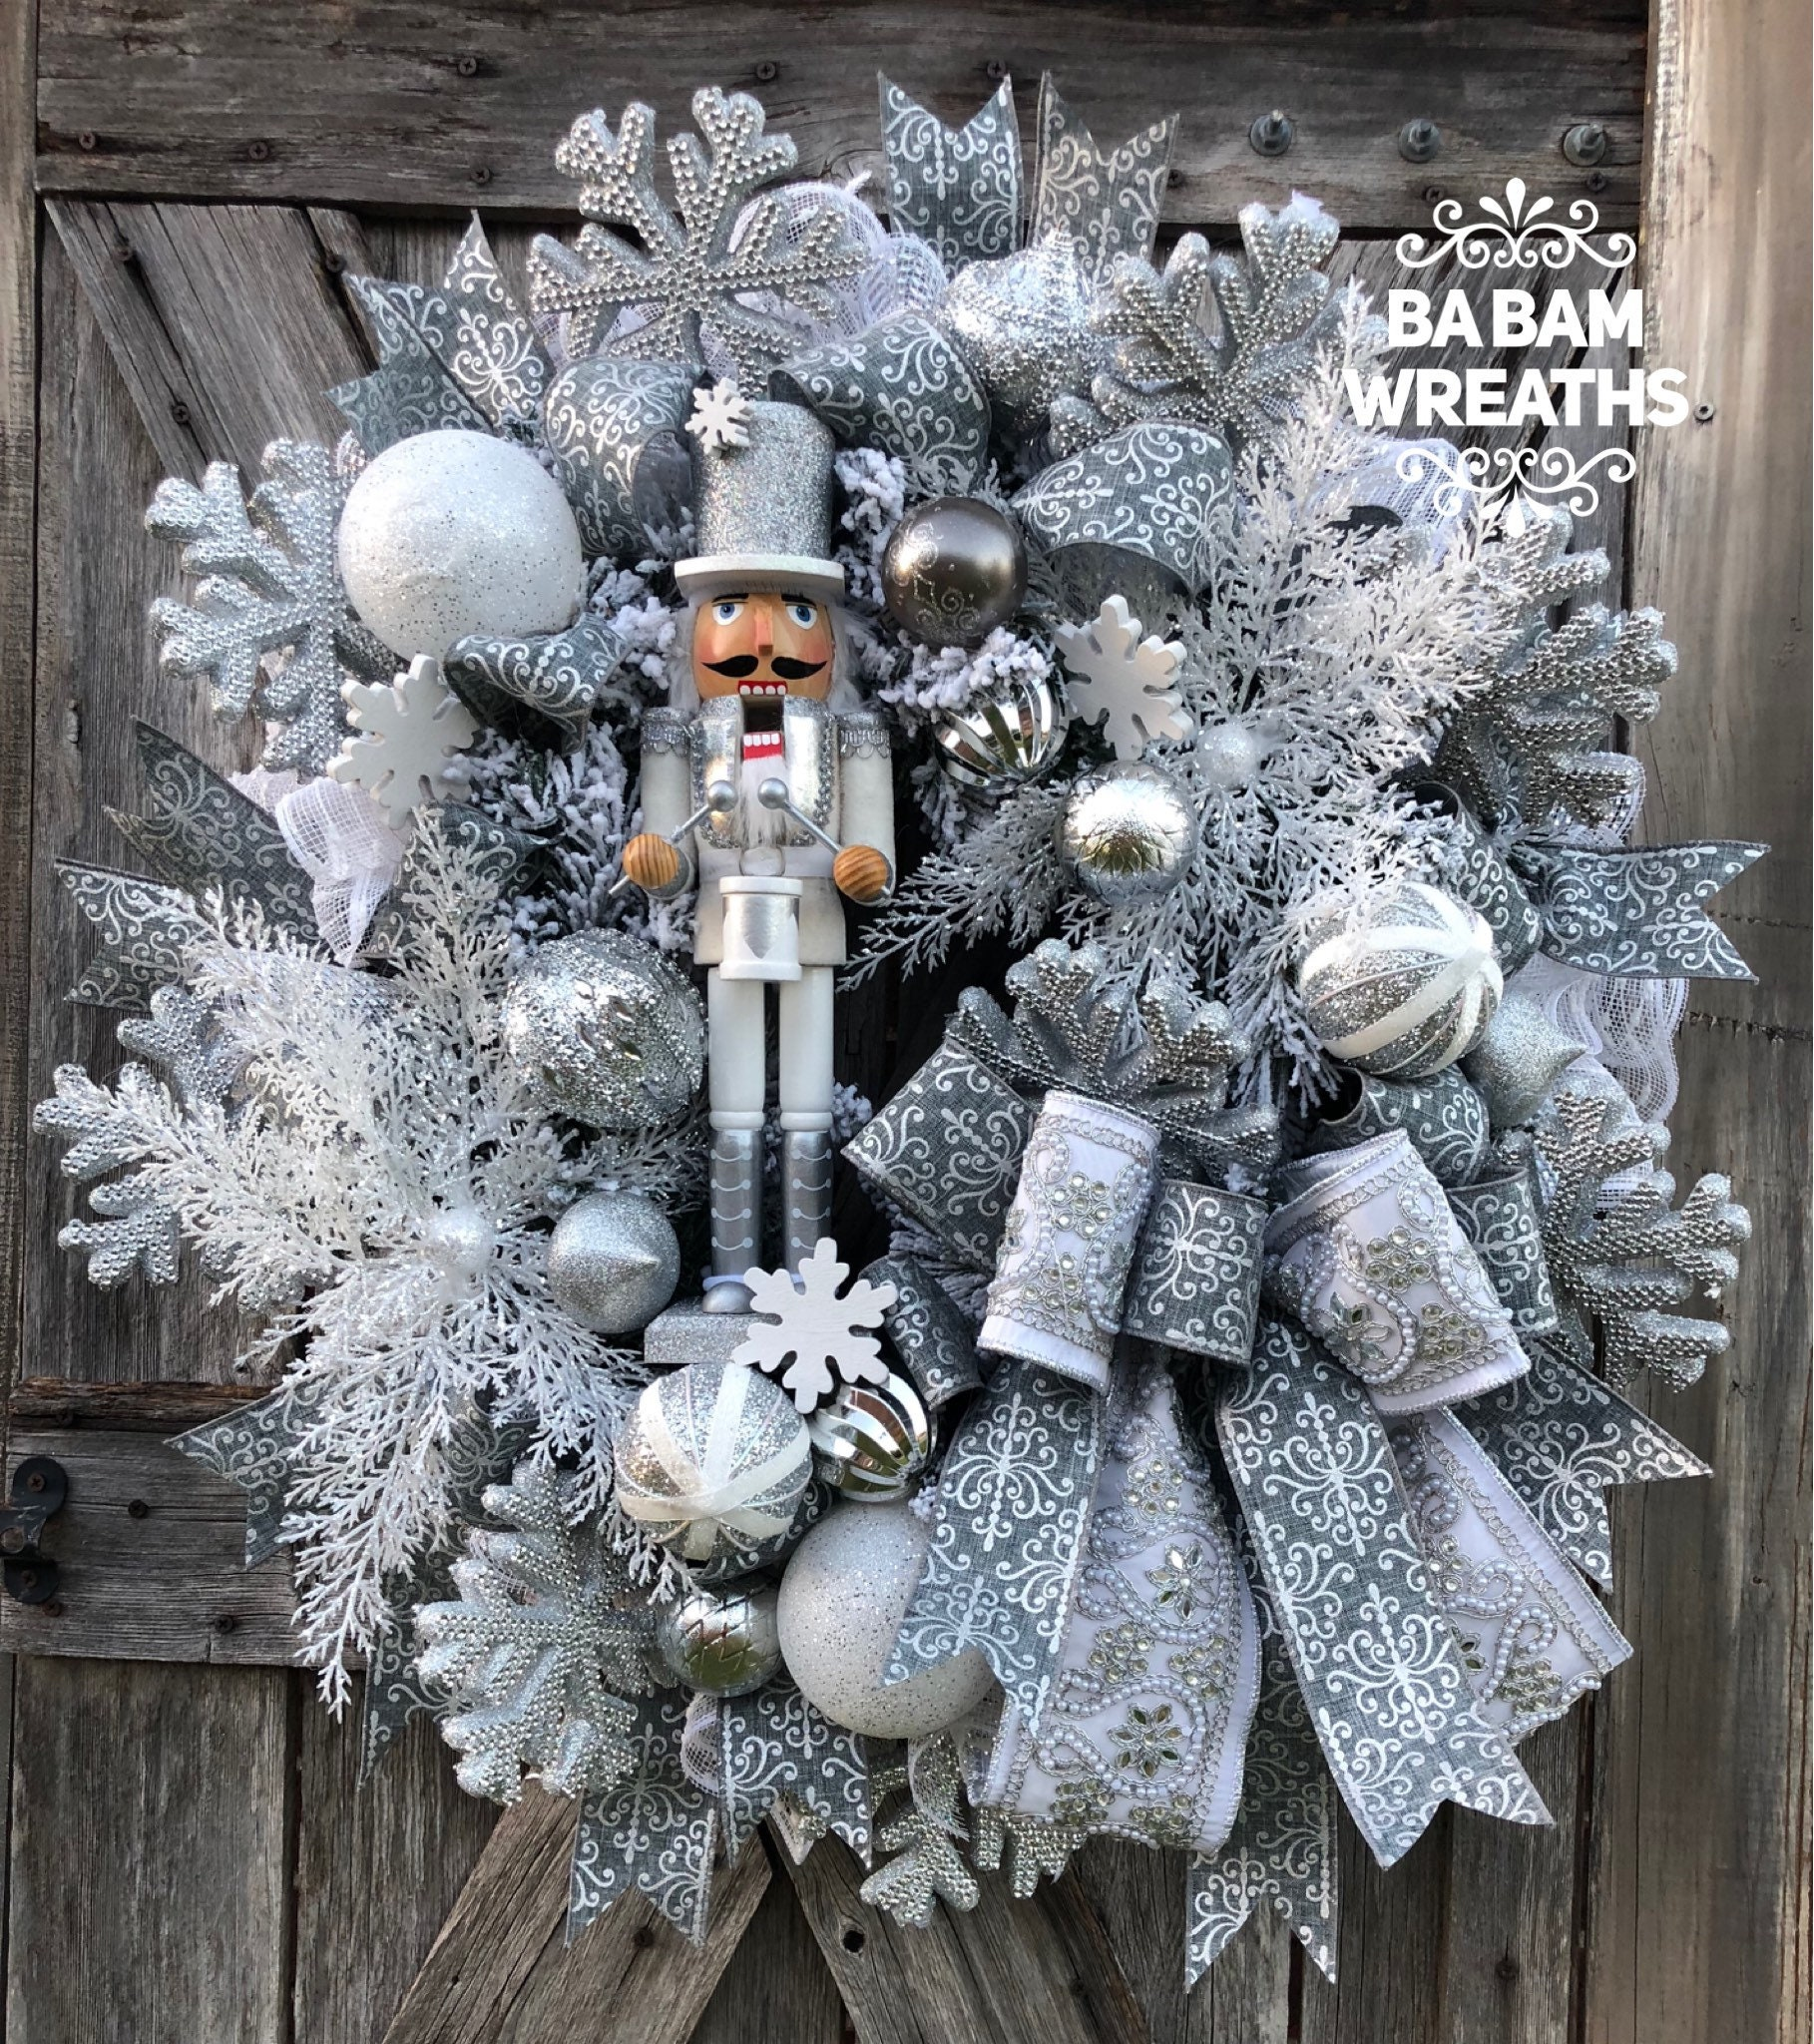 Silver Christmas Wreath.Nutcracker White Silver Christmas Nutcracker Wreath